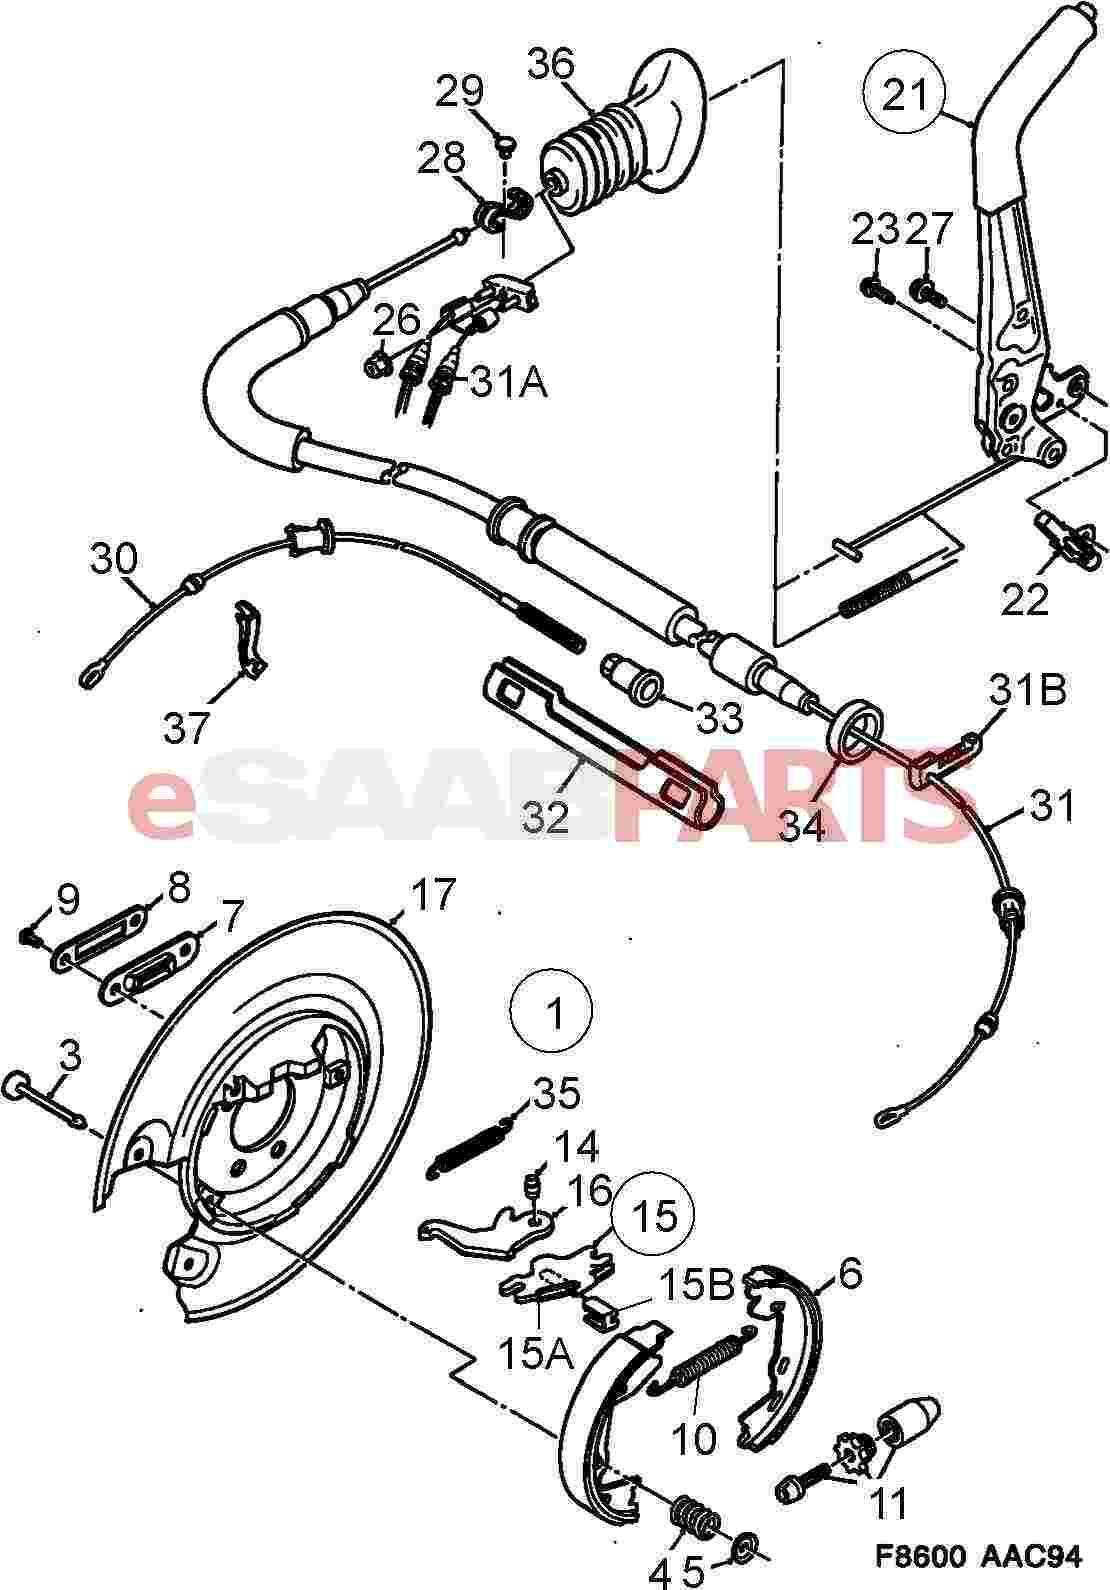 Saab 900 Diagram Showing Brake Line